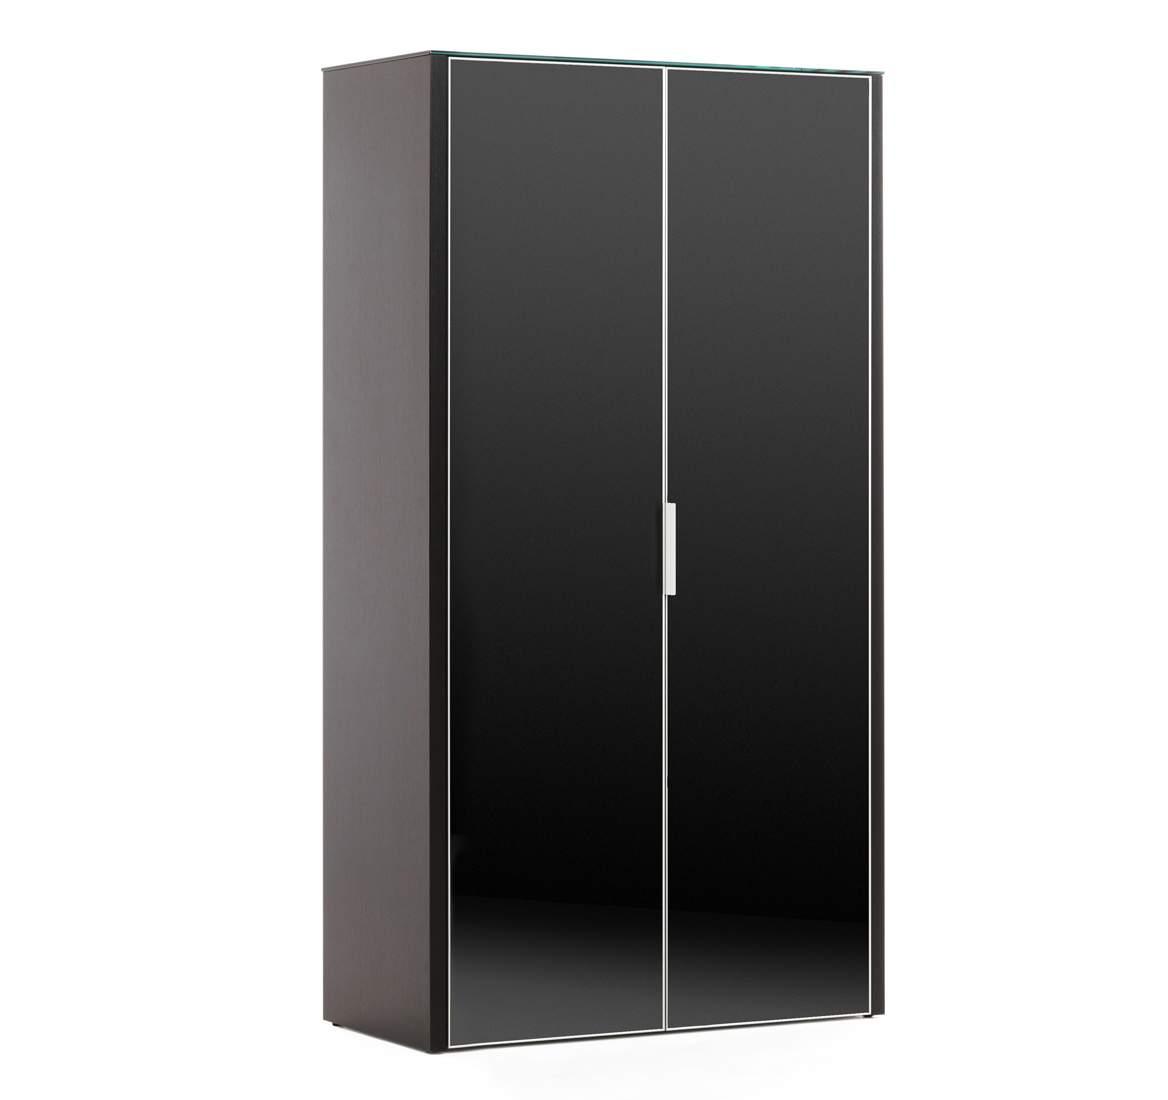 Каркас шкафа высокий 966x452x1714